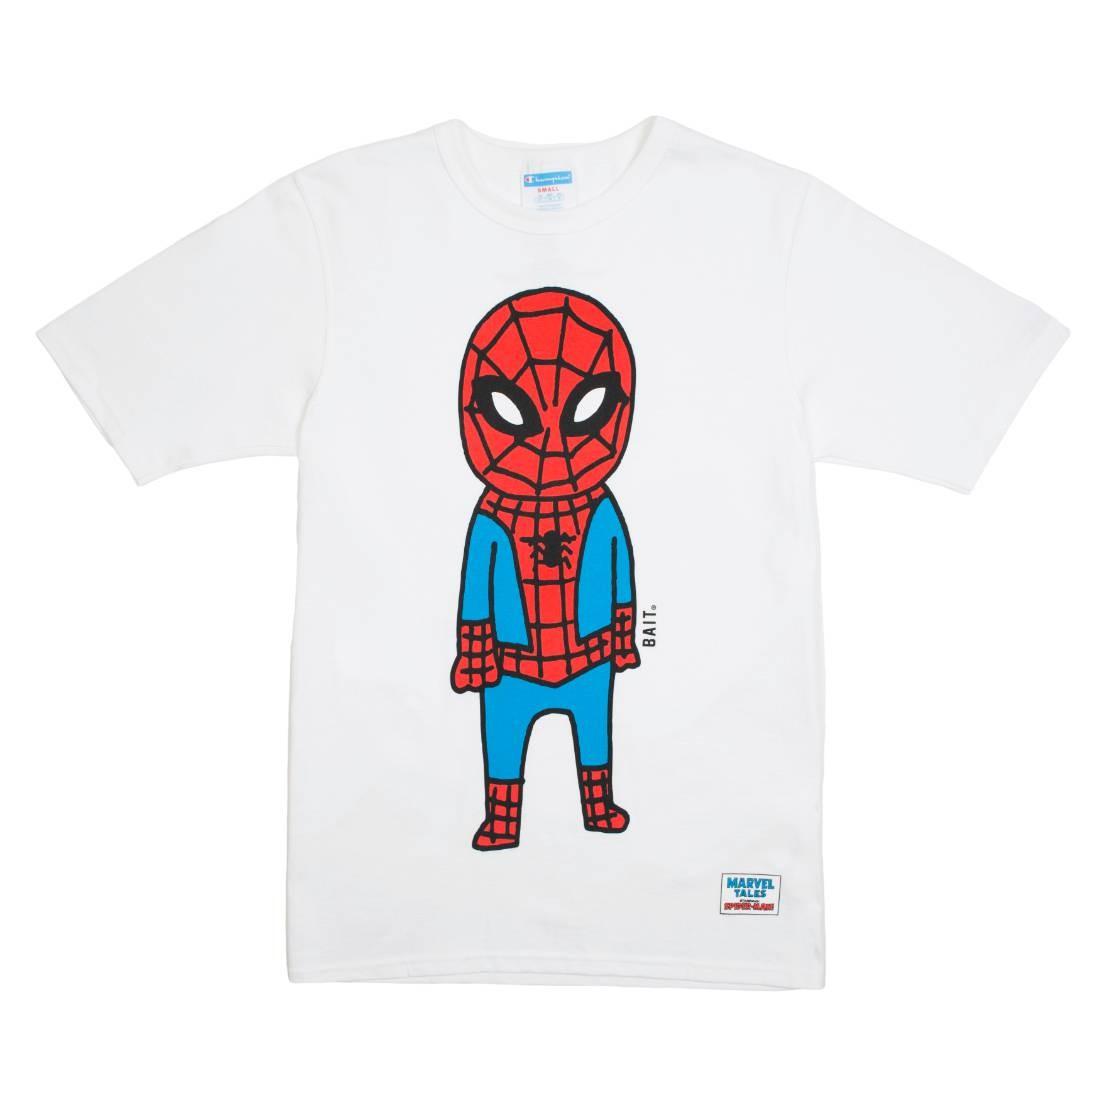 BAIT x Spiderman x Champion Men Spiderman Doodle Tee (white)